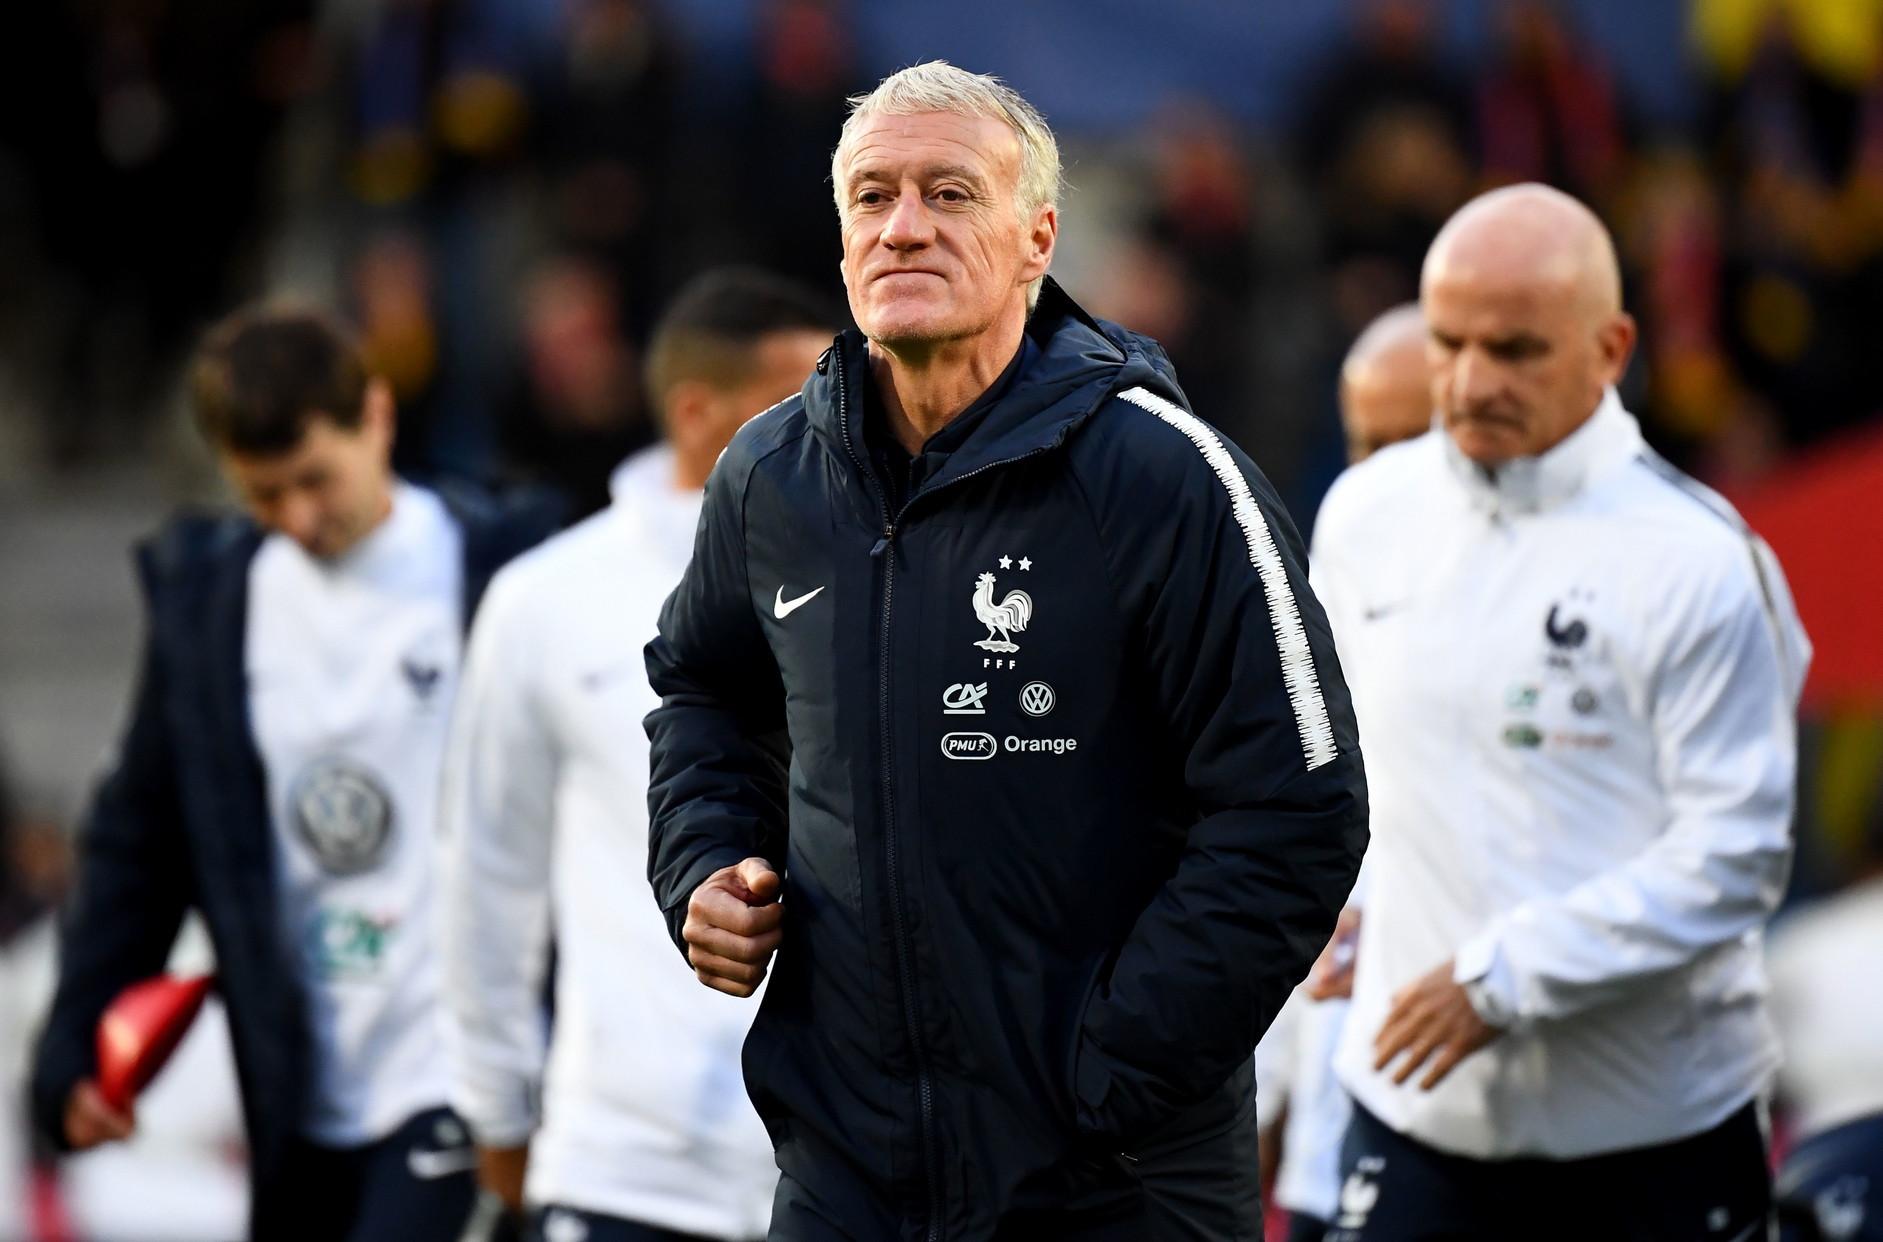 Didier Deschamps ct della Francia, campione del Mondo nel 2018